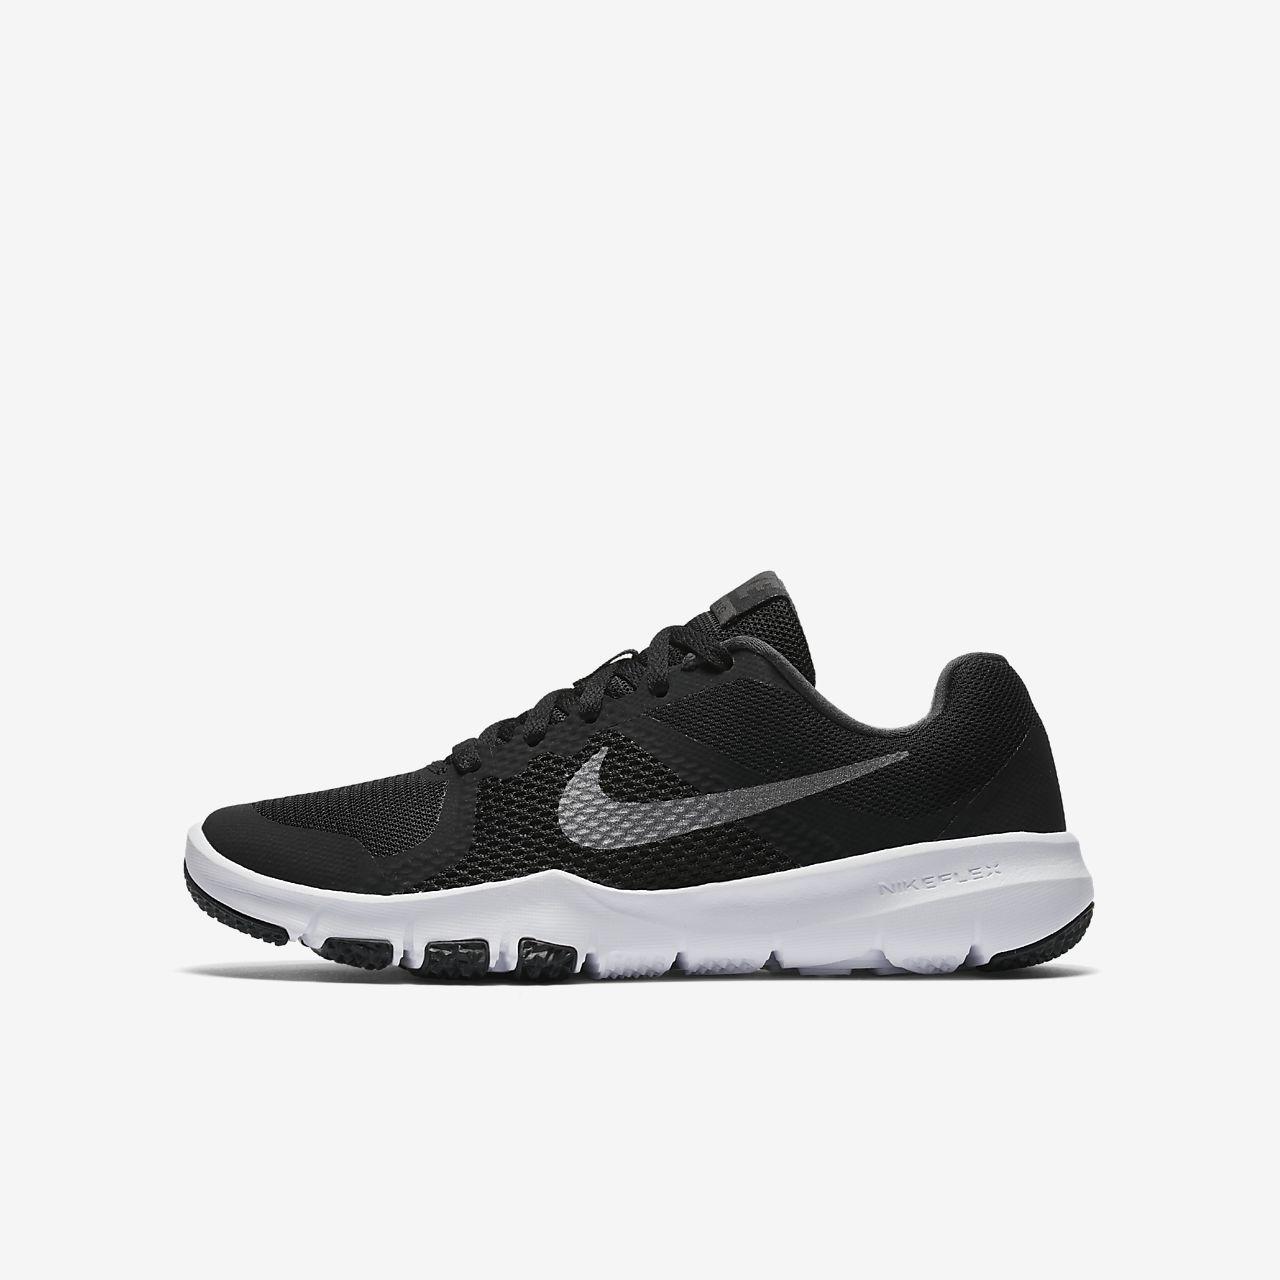 nike tanjun boys' running shoes nz